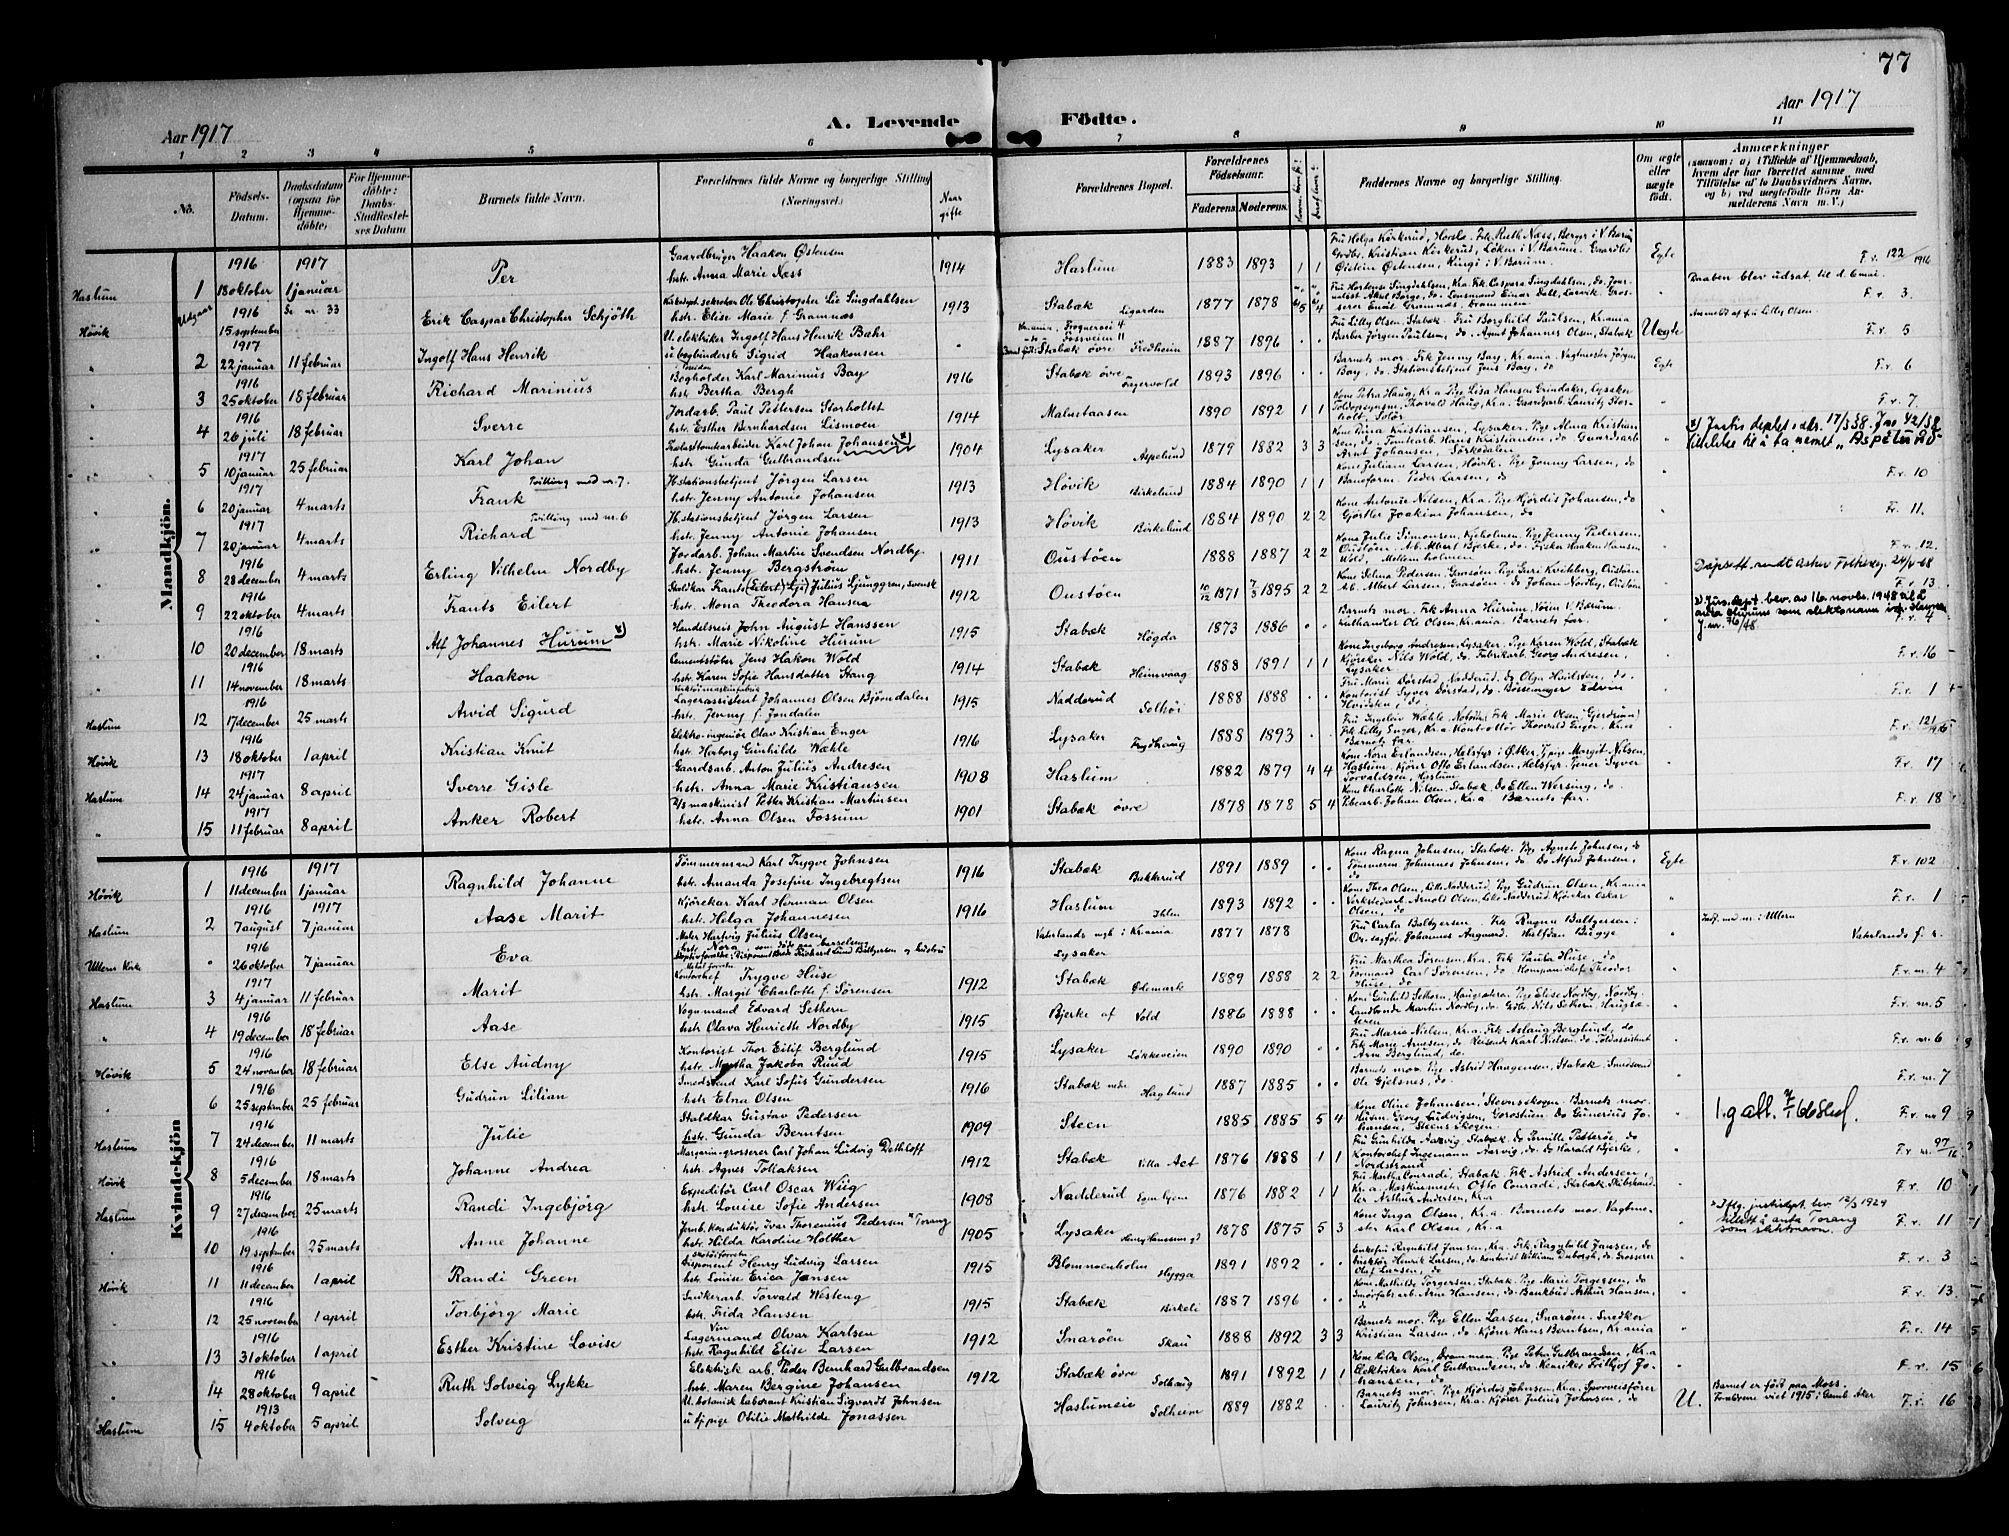 SAO, Østre Bærum prestekontor Kirkebøker, F/Fa/L0001: Ministerialbok nr. 1, 1905-1924, s. 77